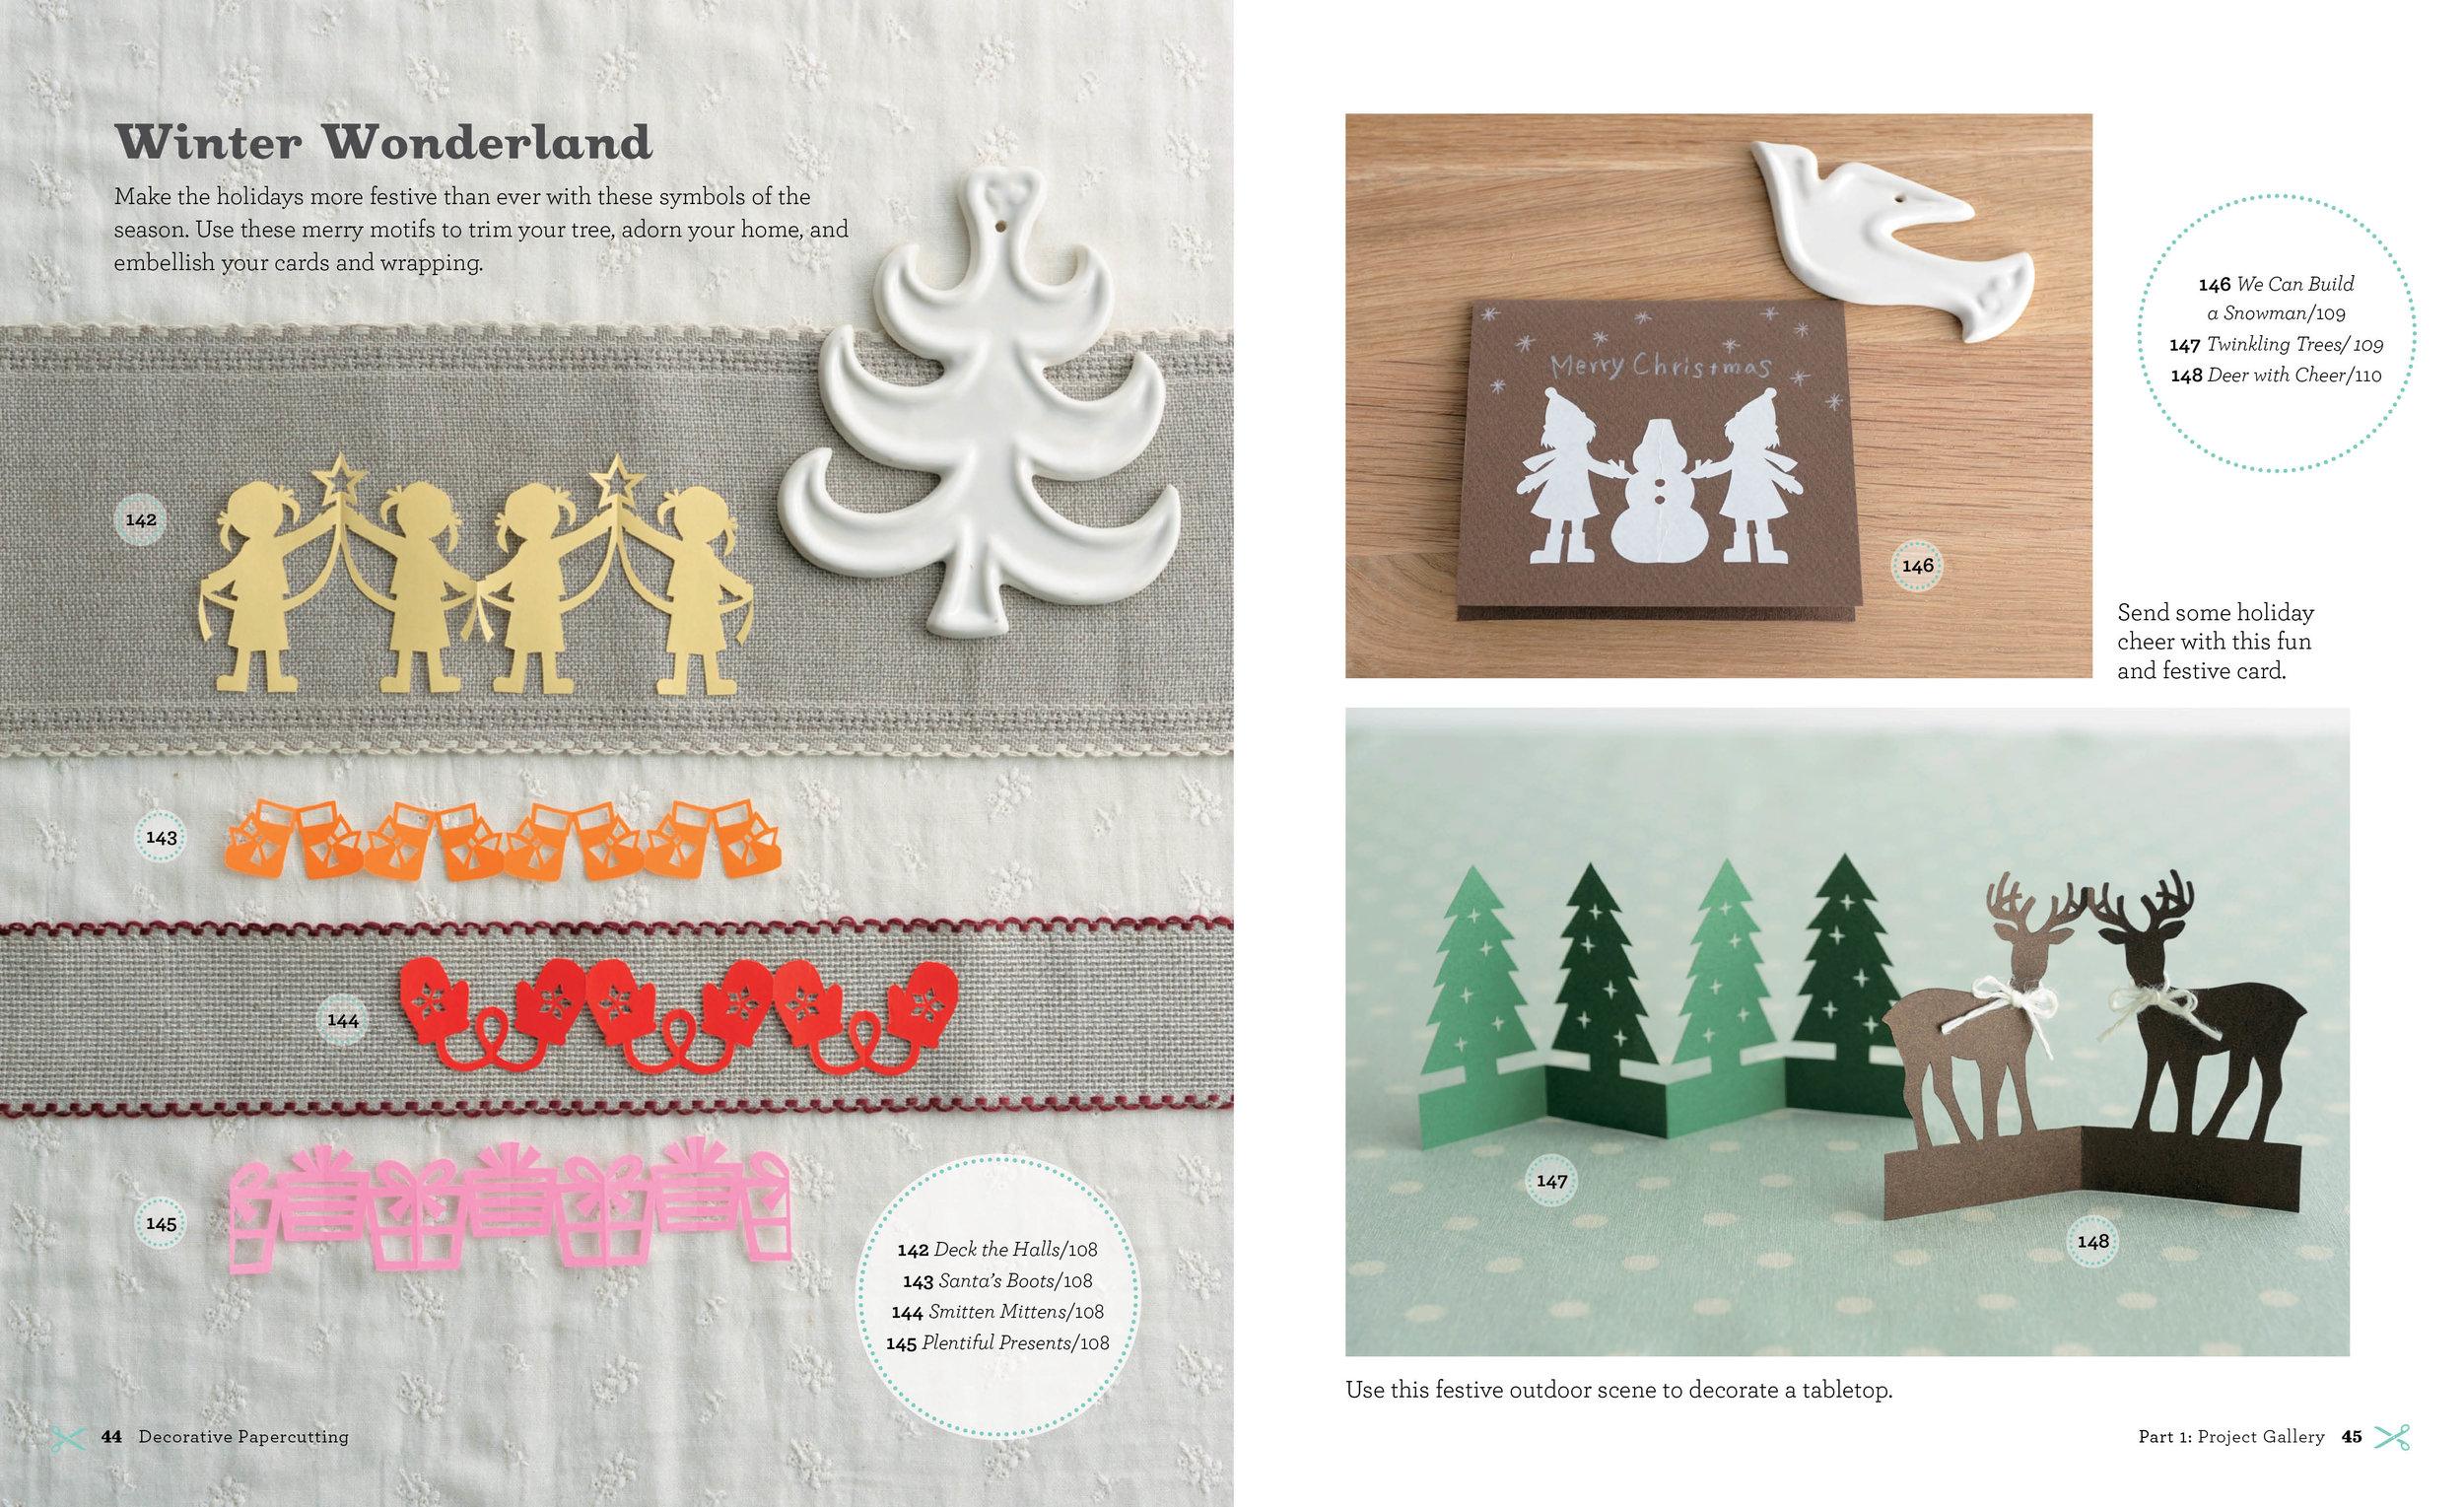 Decorative Papercutting 44.45.jpg